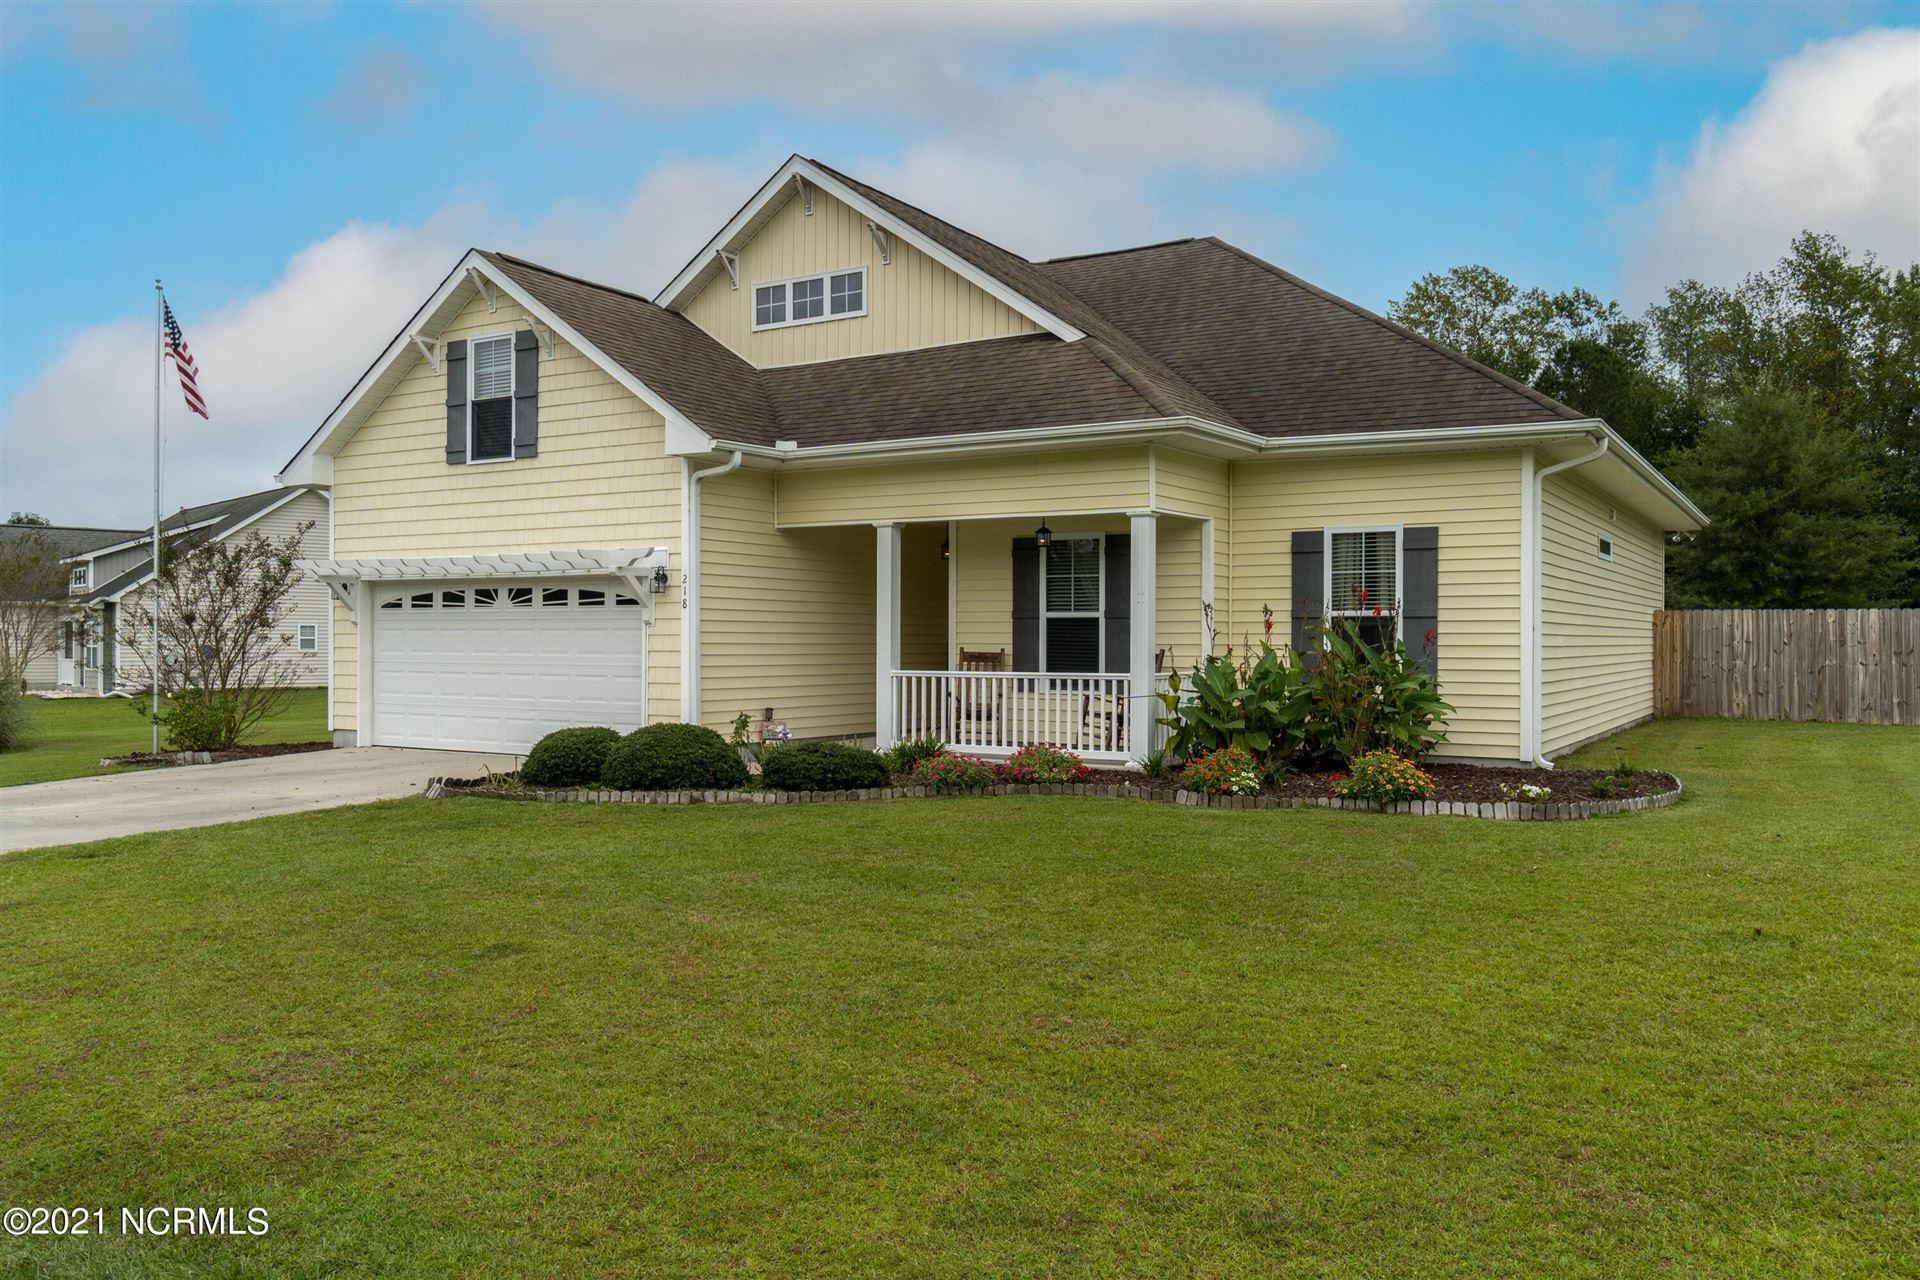 Photo of 218 Blue Creek Farms Drive, Jacksonville, NC 28540 (MLS # 100293237)